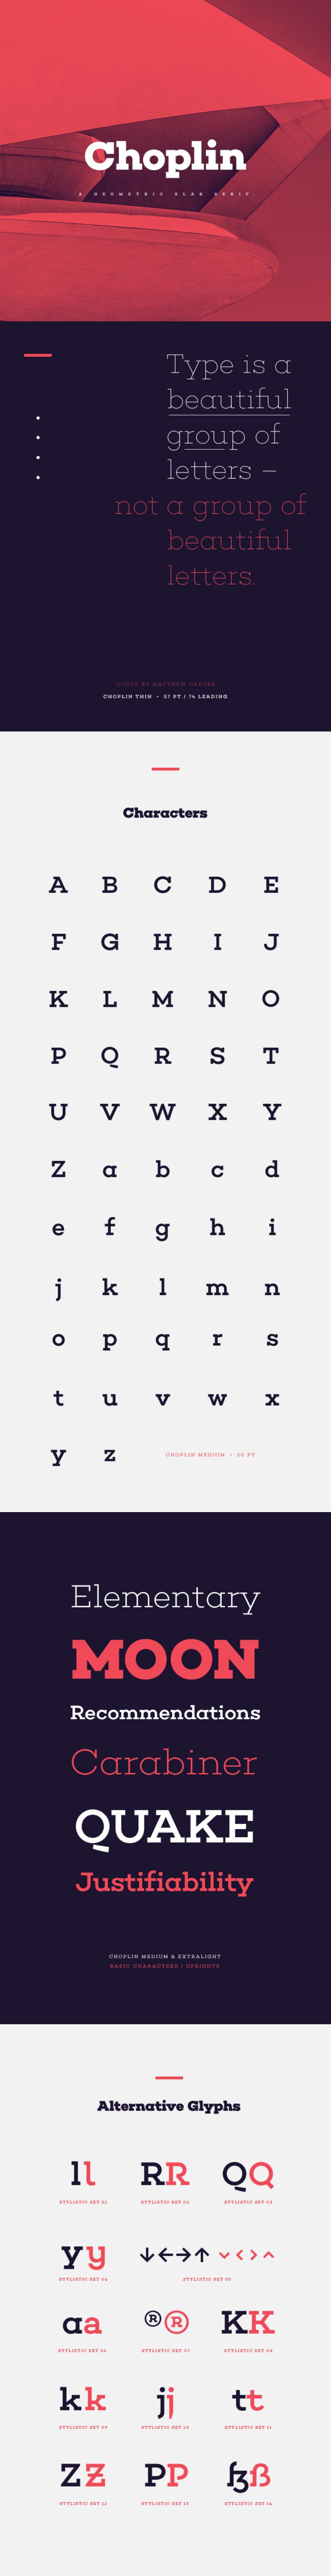 Choplin Free Font - Fontfabric